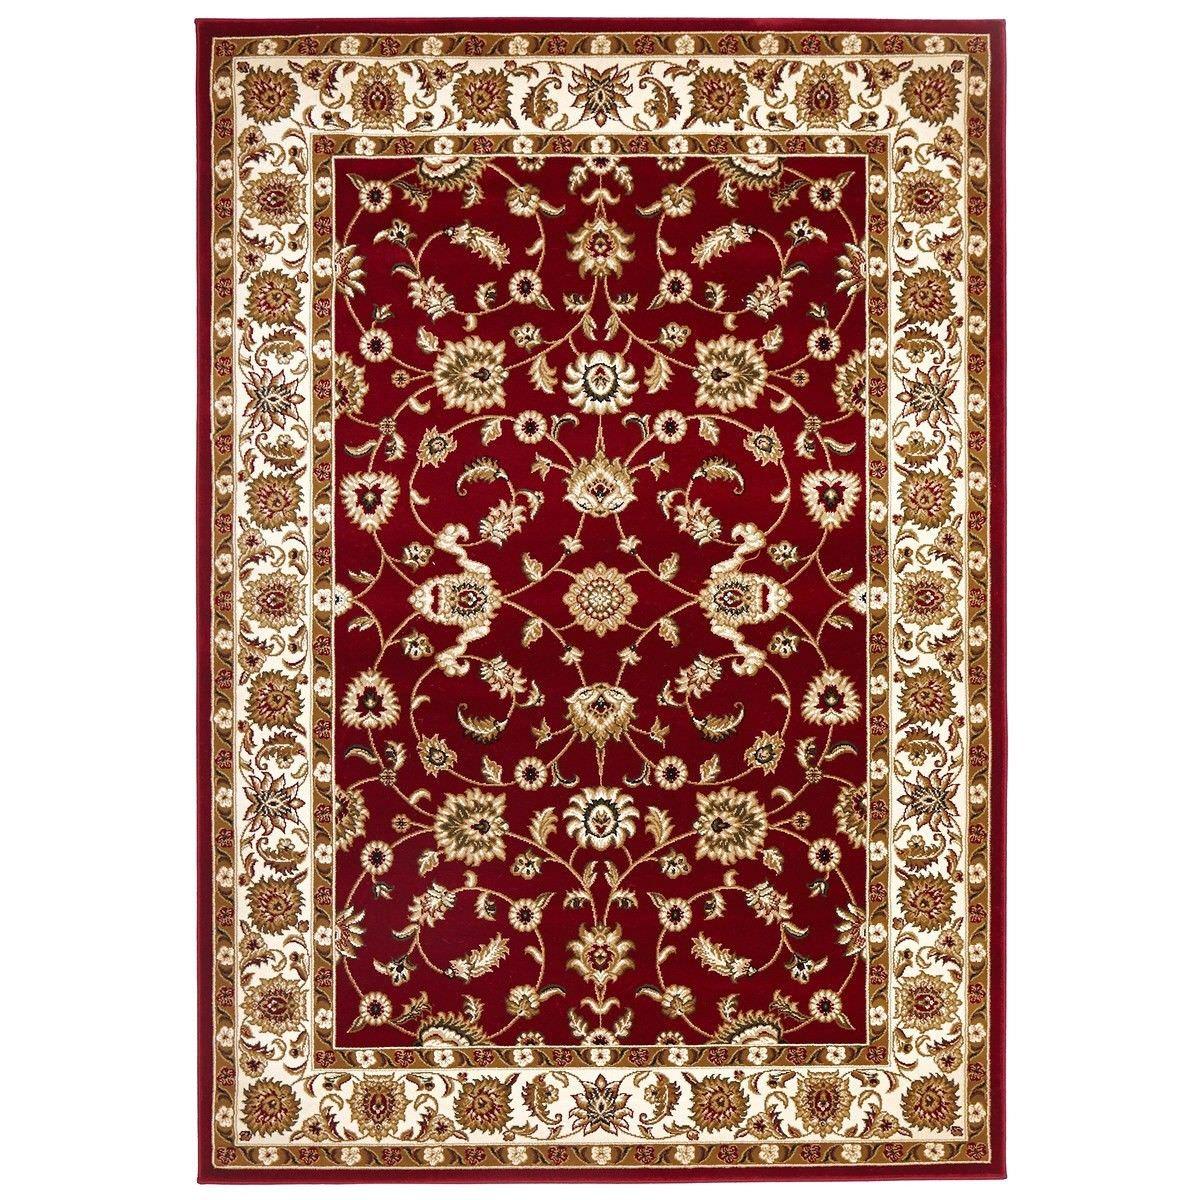 Sydney Classic Turkish Made Oriental Rug, 170x120cm, Red / Ivory